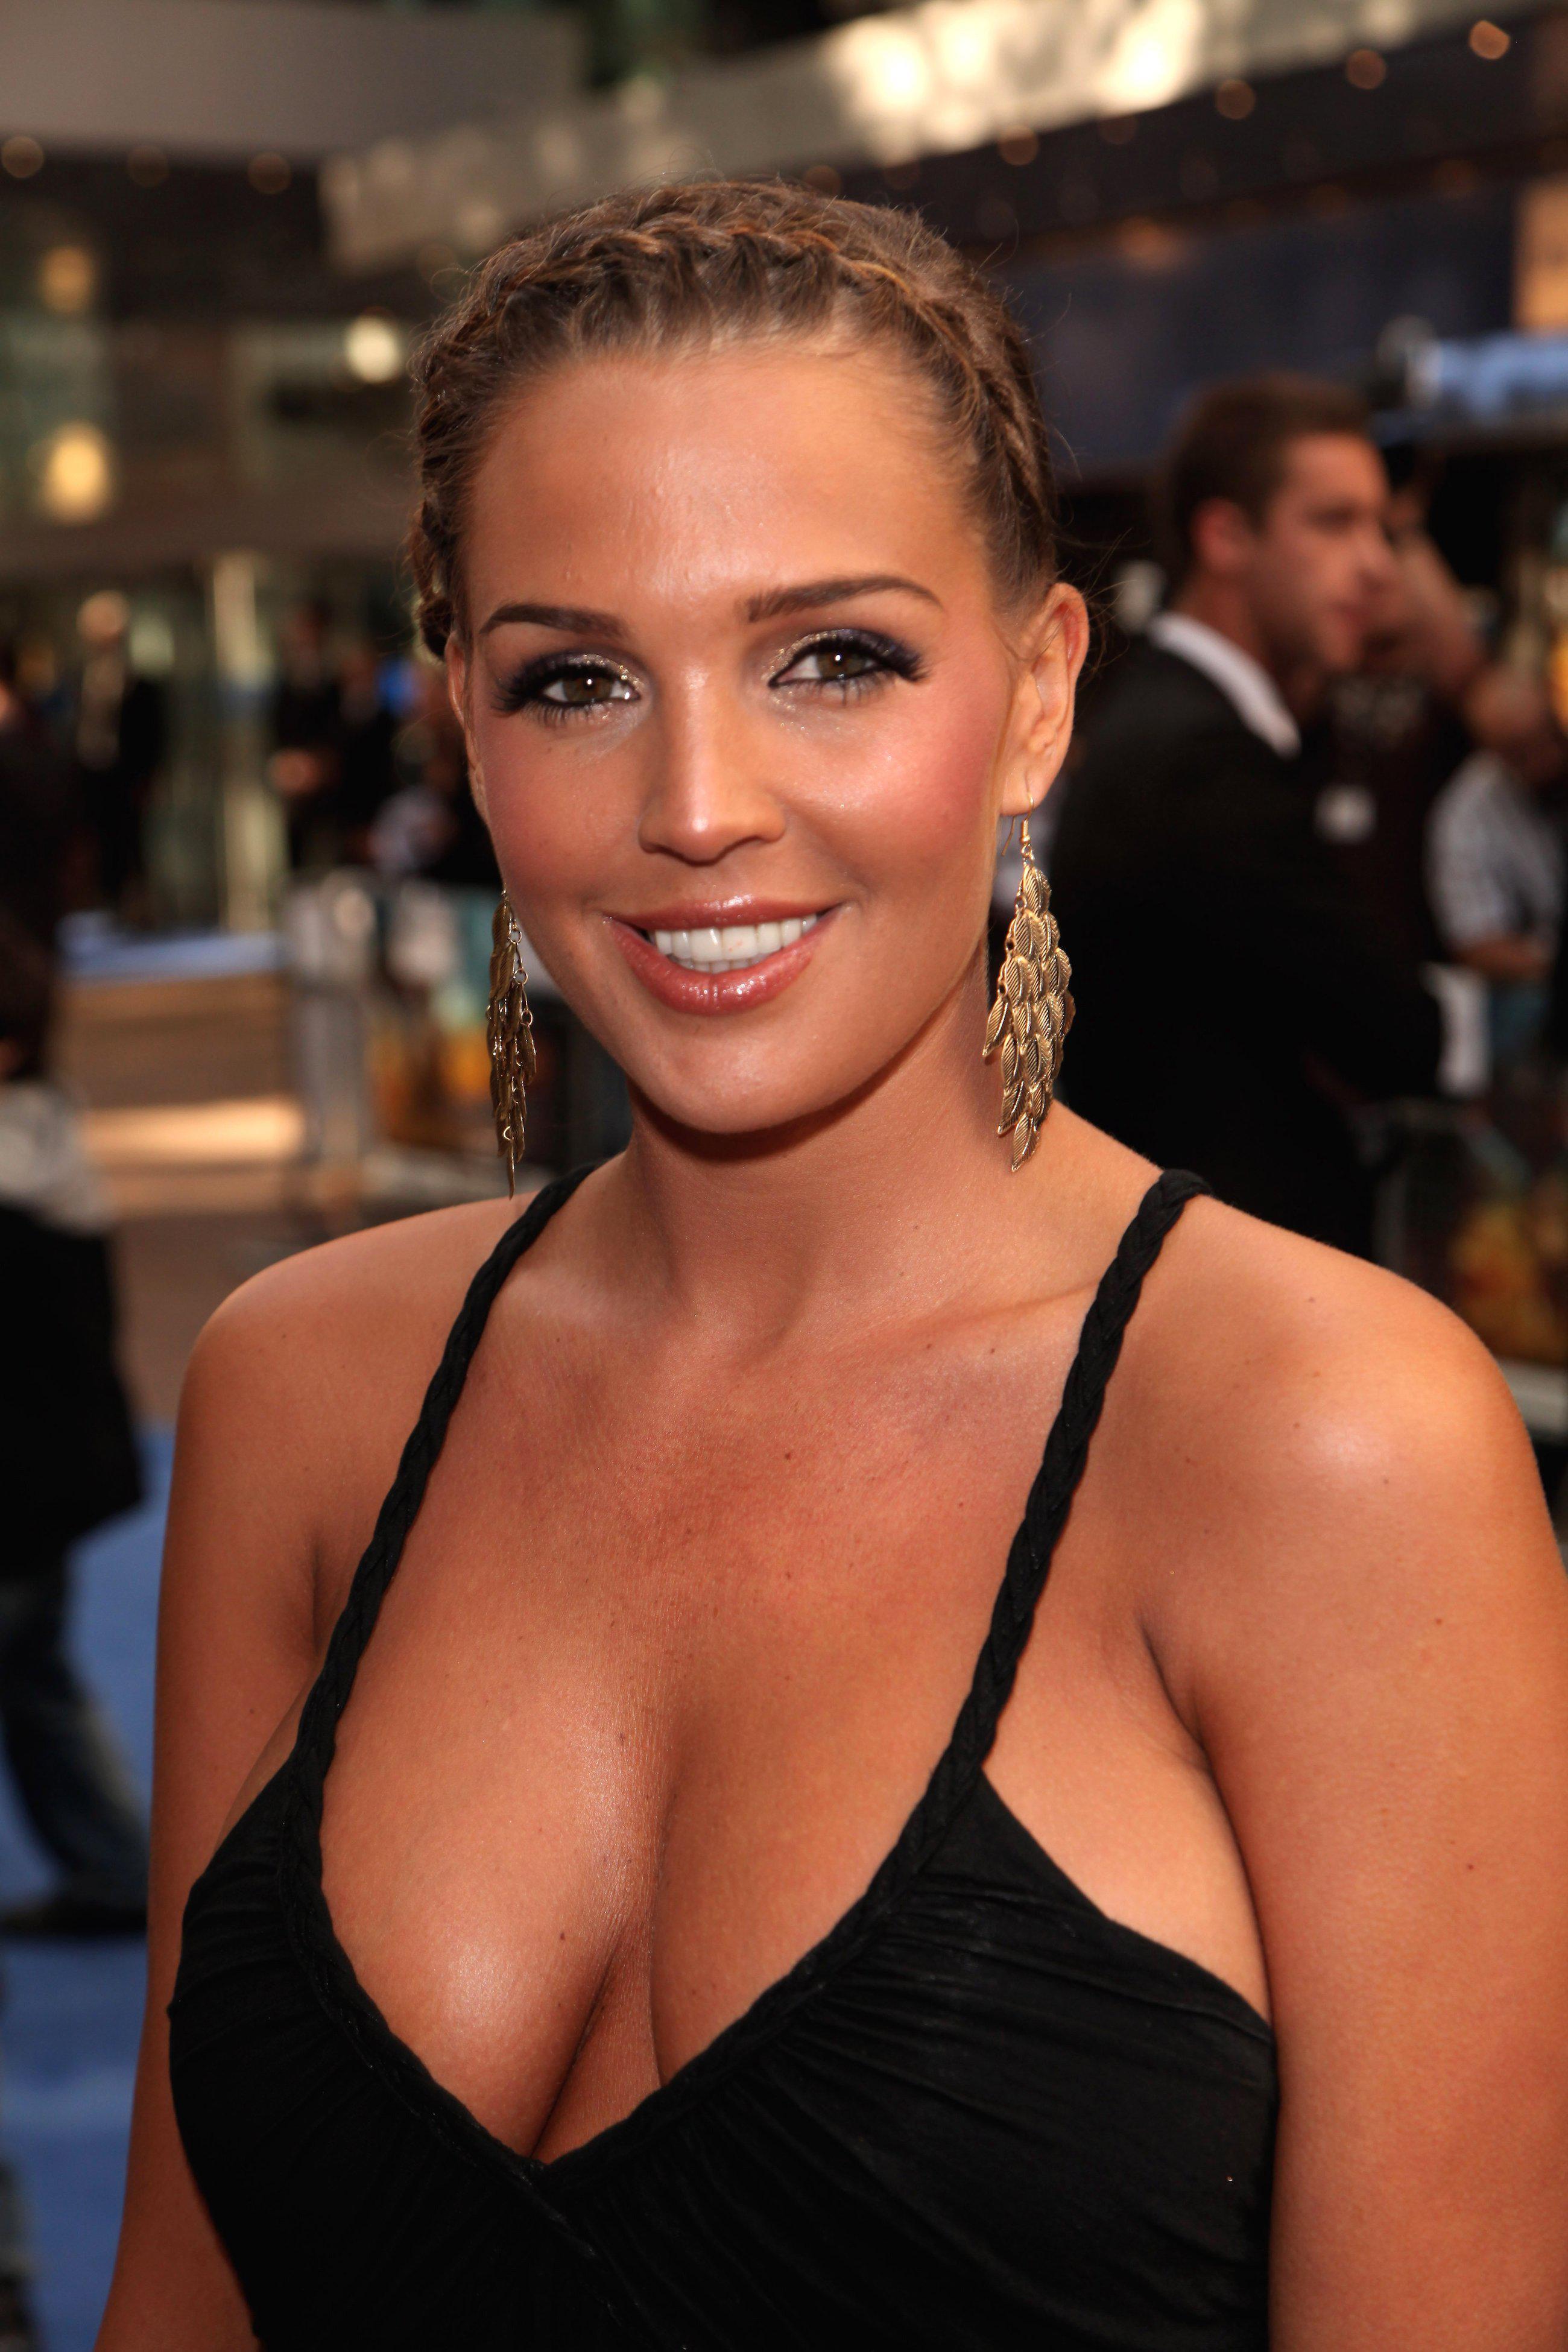 Danielle lloyd cumshot, sri lankaise nue porn